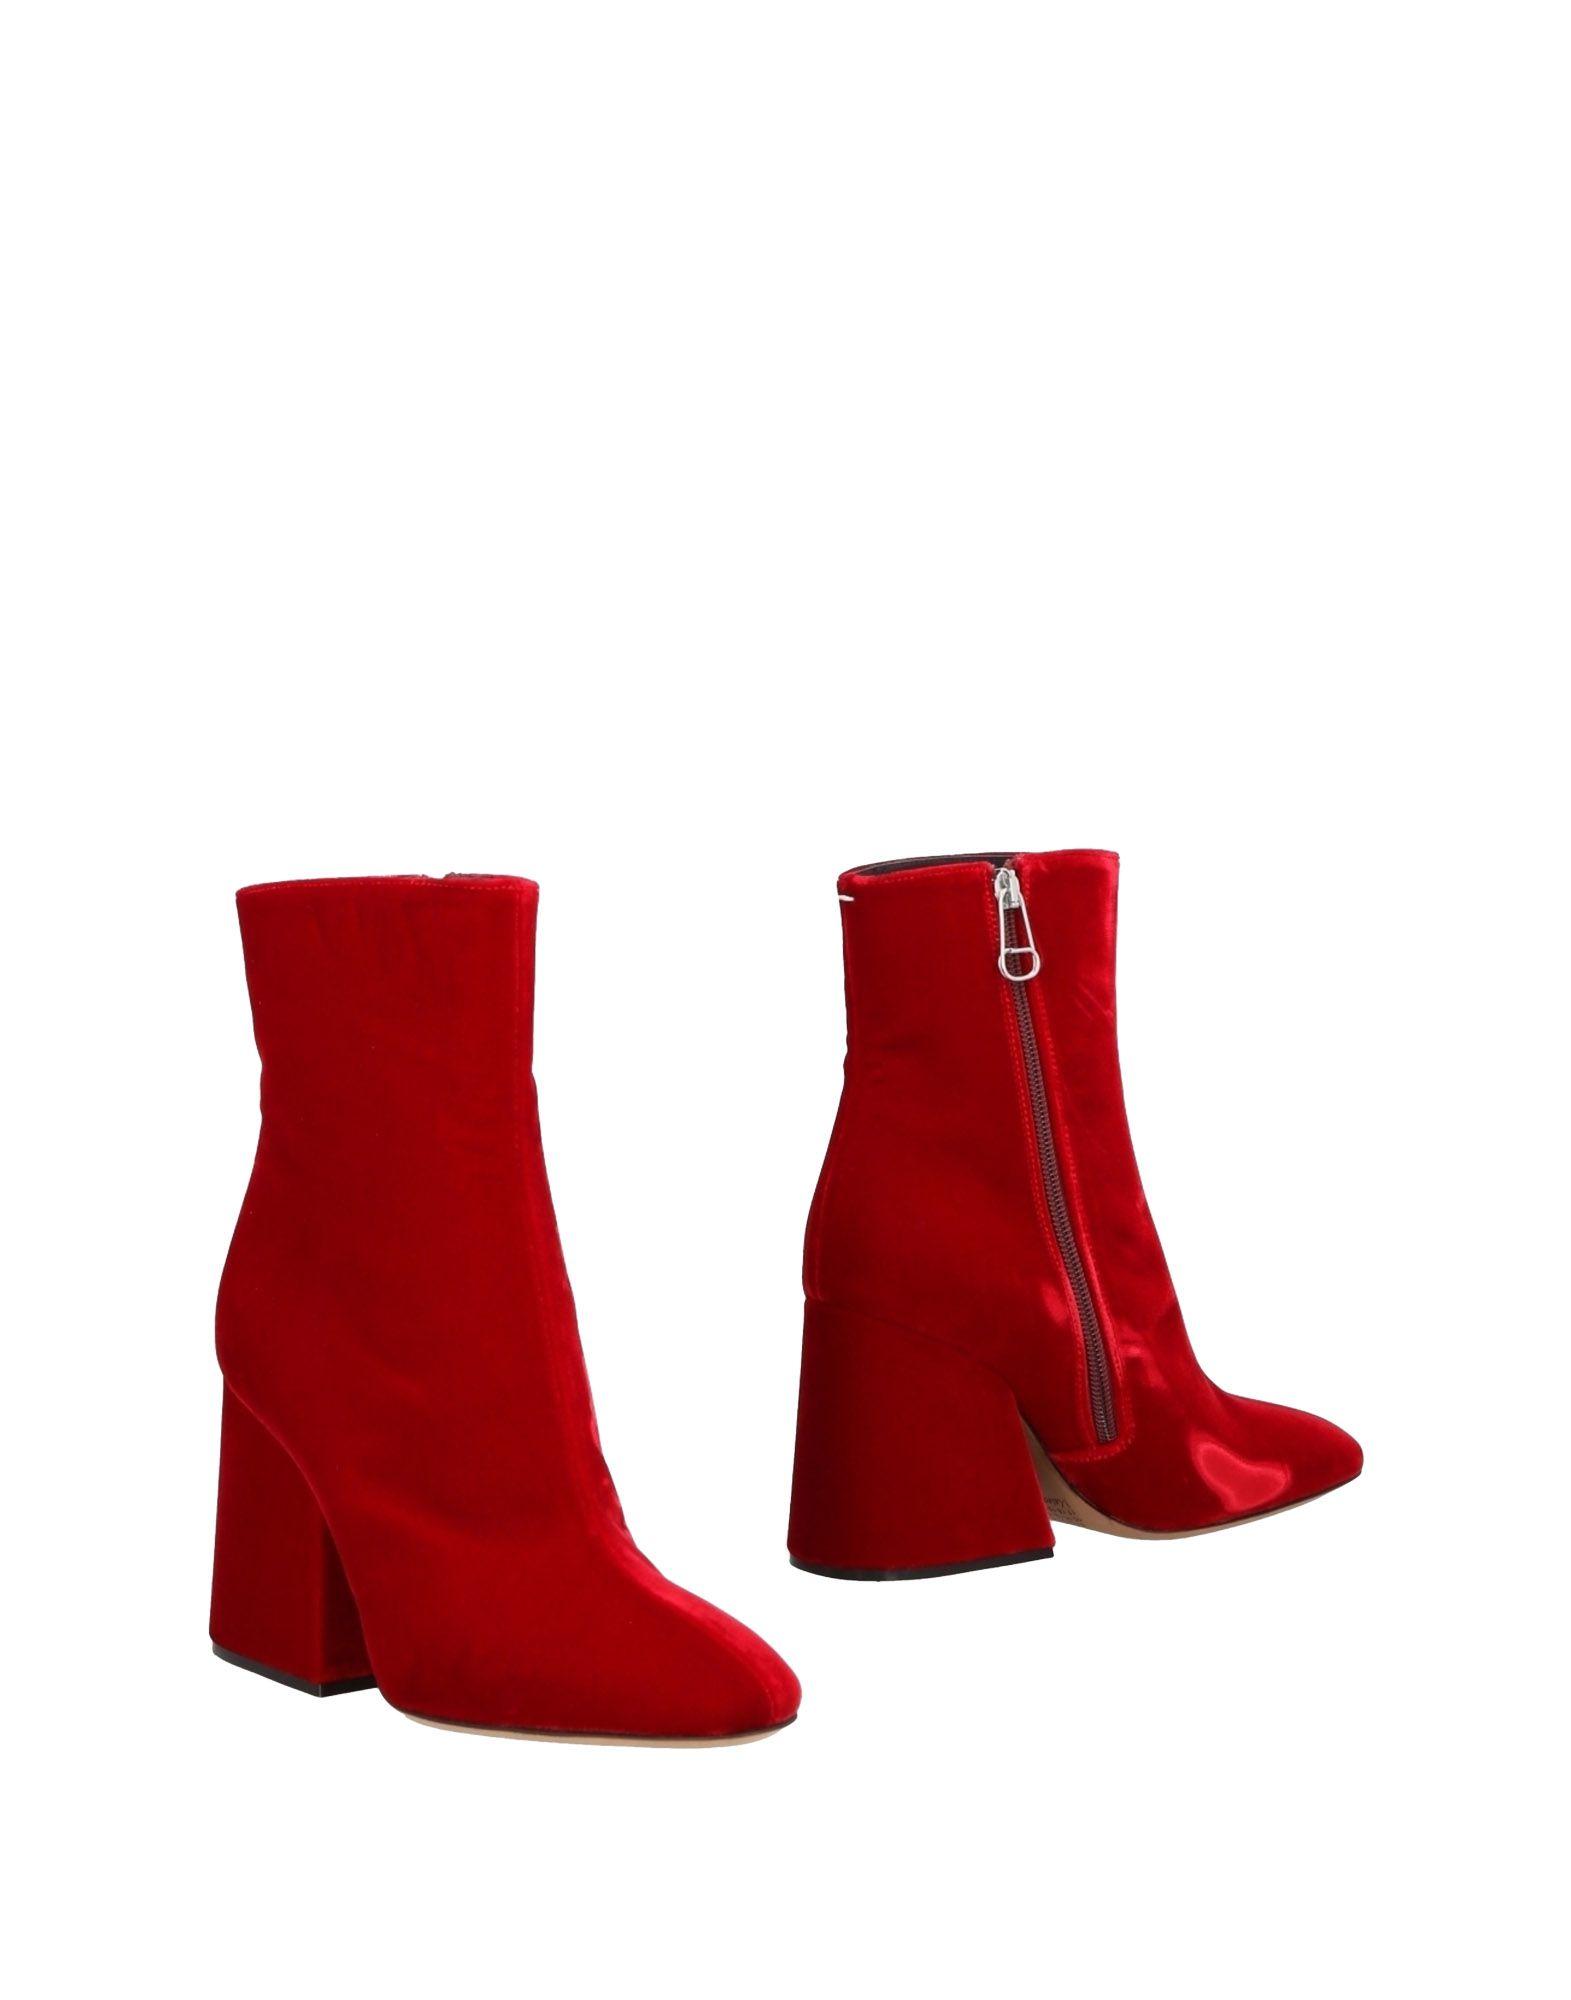 Maison Margiela Stiefelette Damen Schuhe  11471986MPGünstige gut aussehende Schuhe Damen d1b991